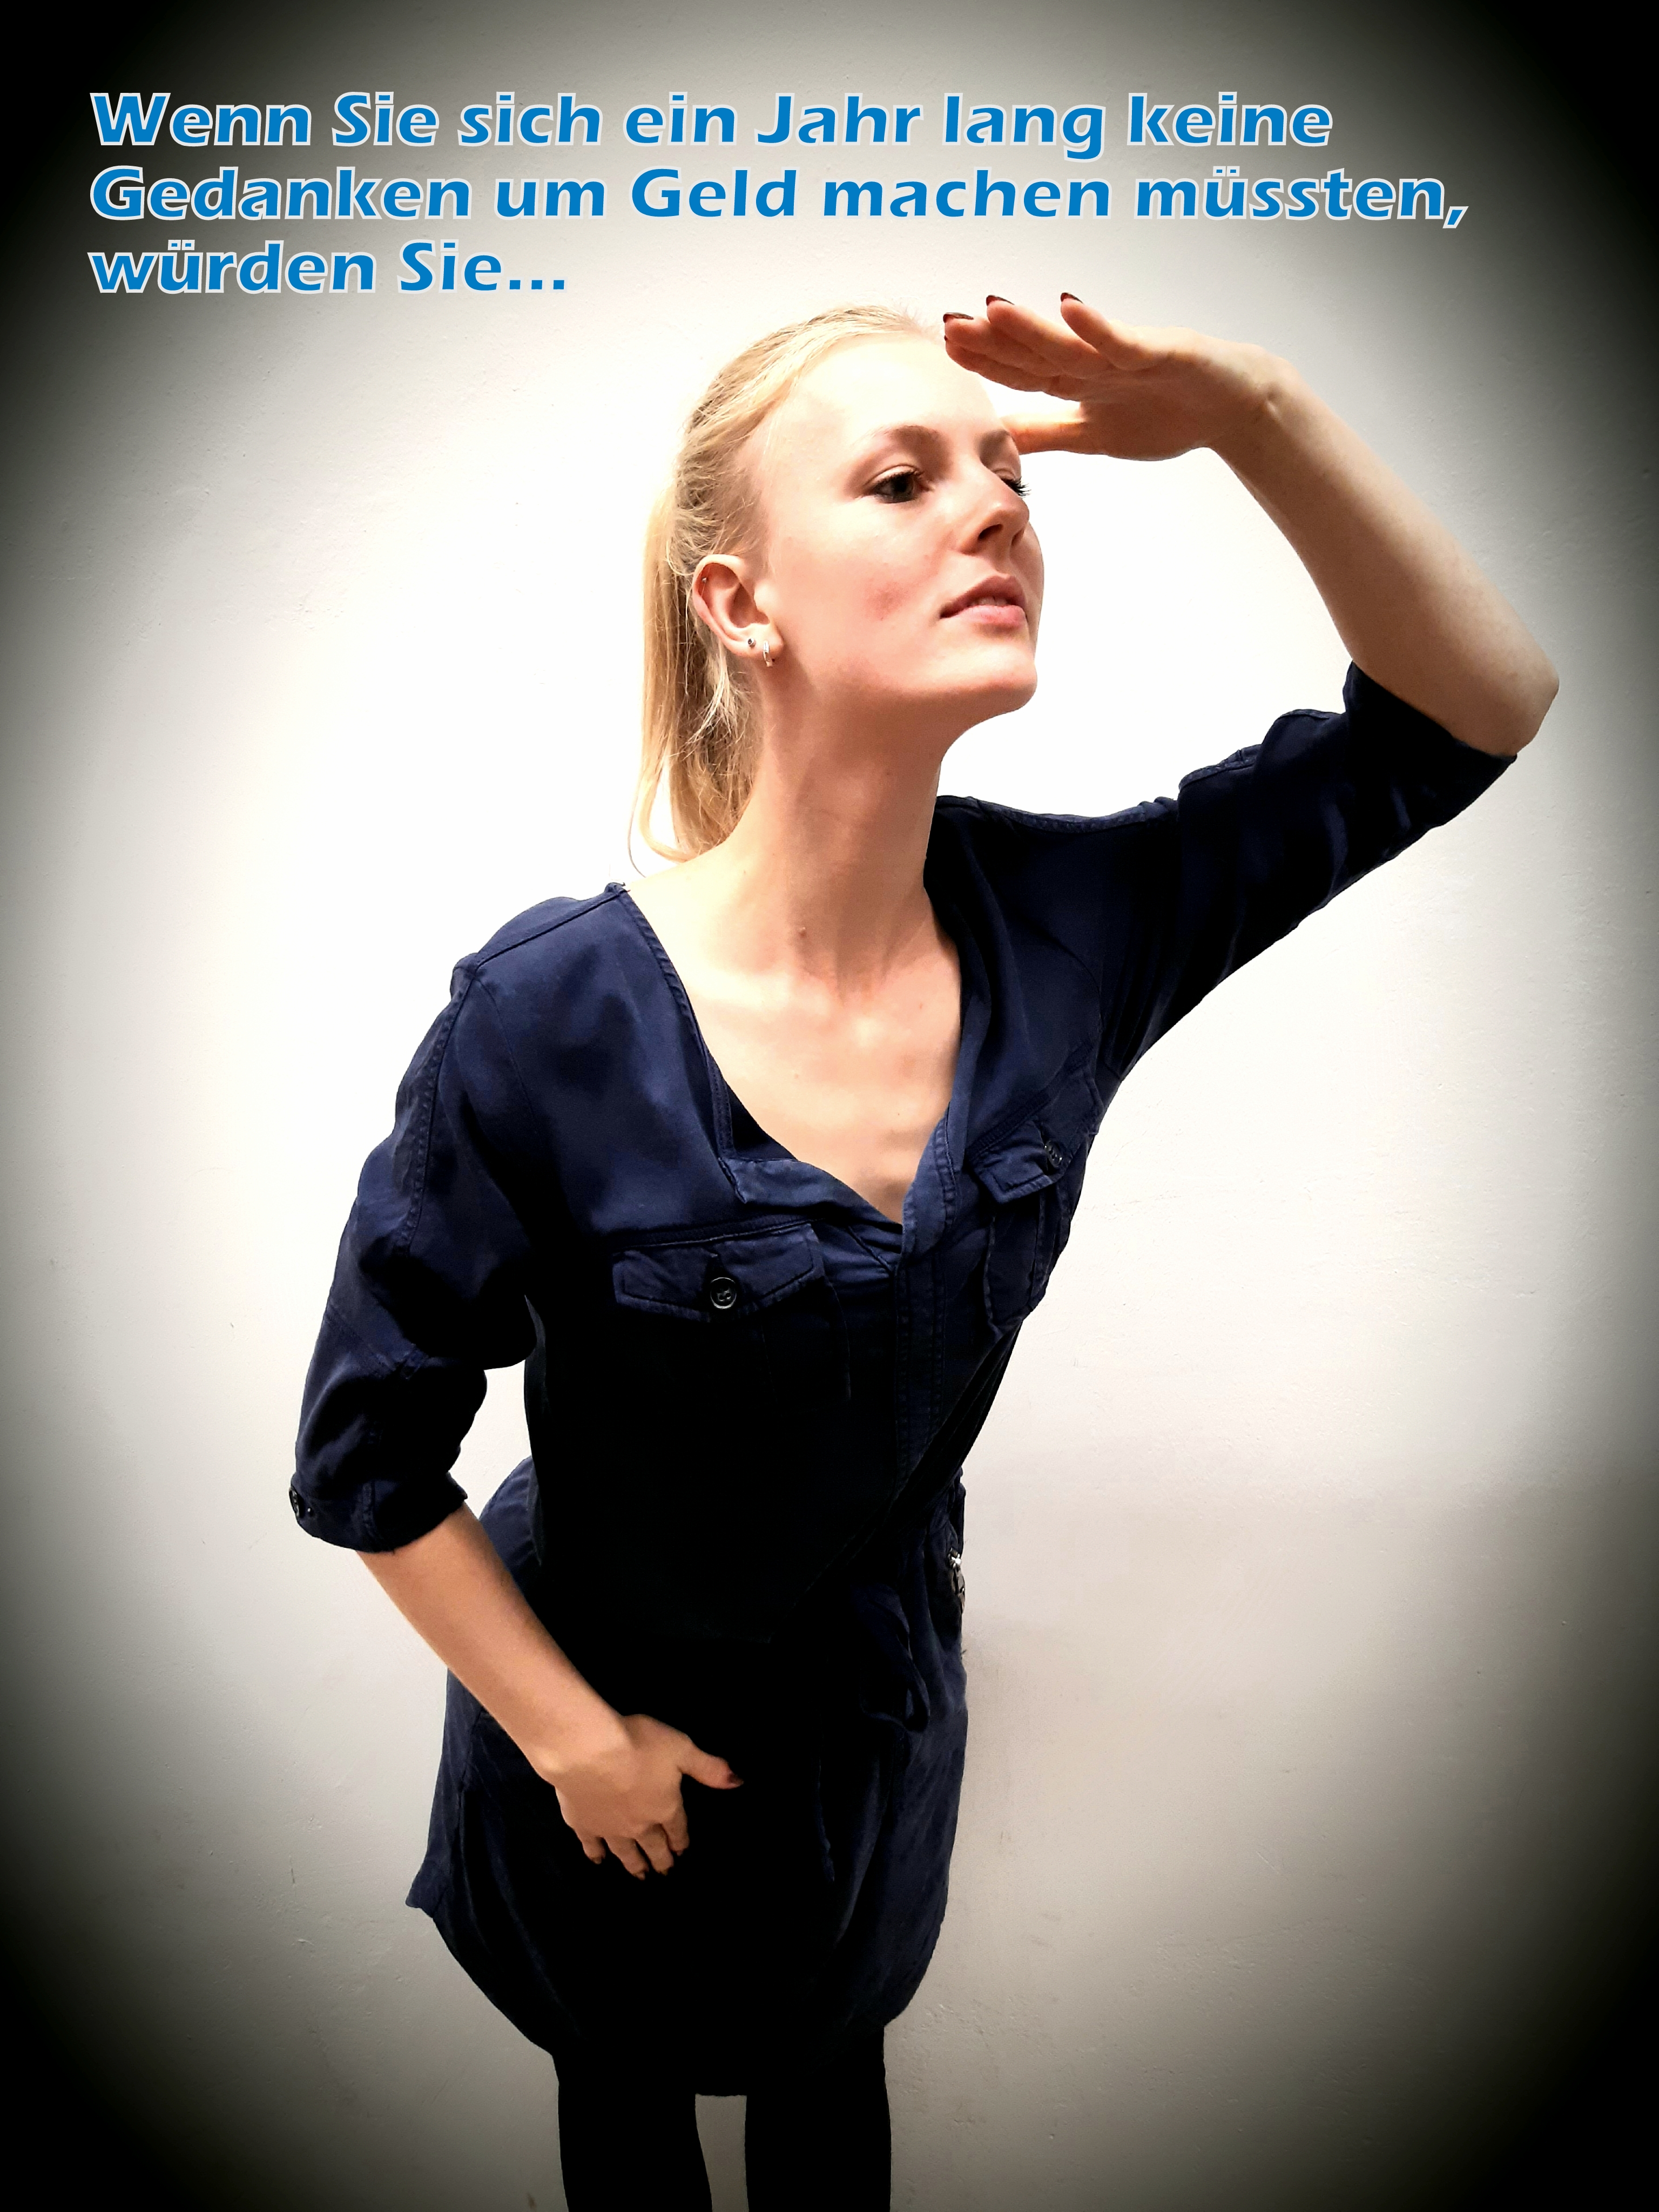 3. Janina Rigat